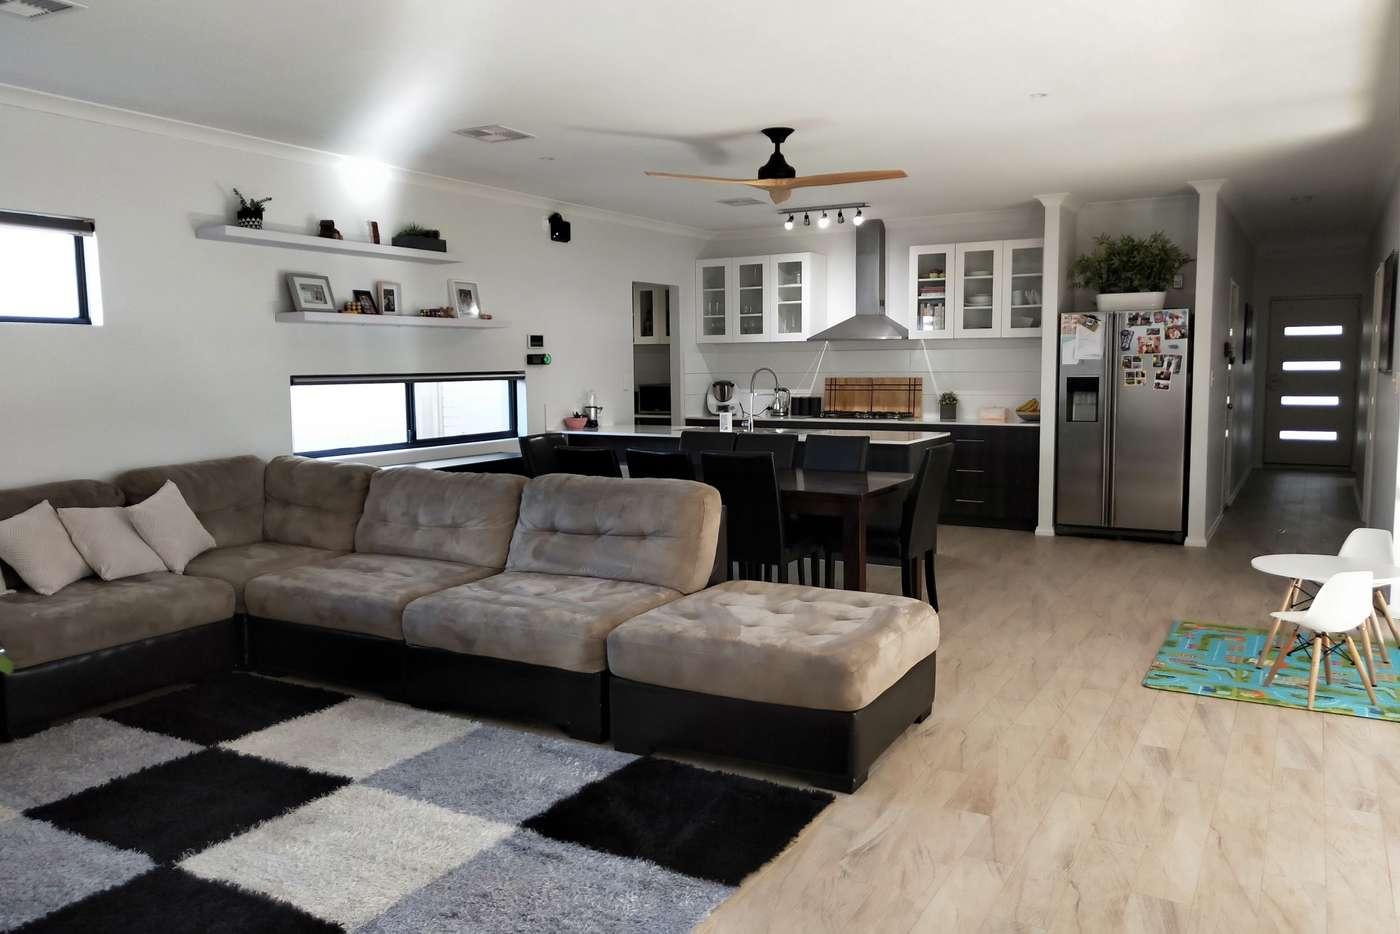 Fifth view of Homely house listing, 13 Flourish Way, Craigie WA 6025